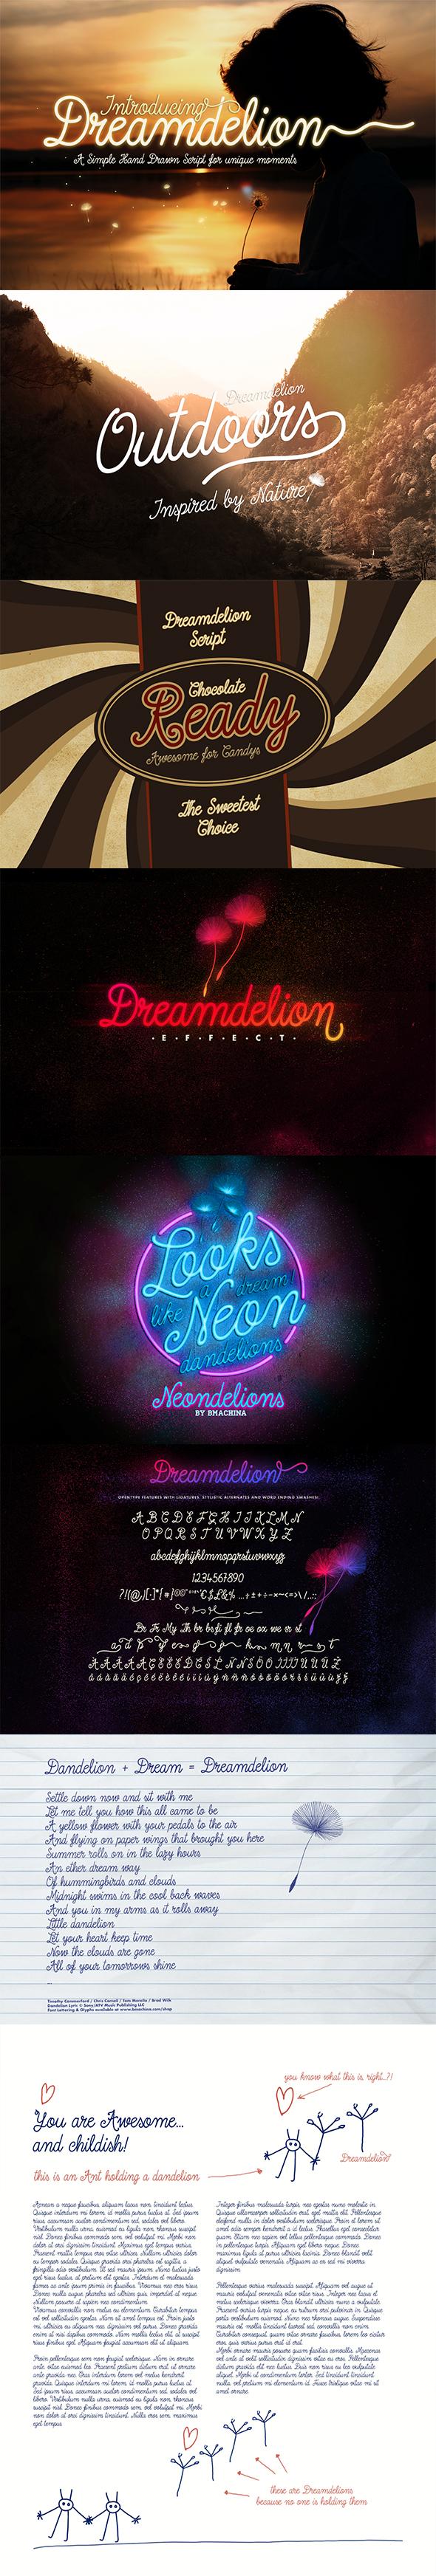 Dreamdelion Font - Hand-writing Script